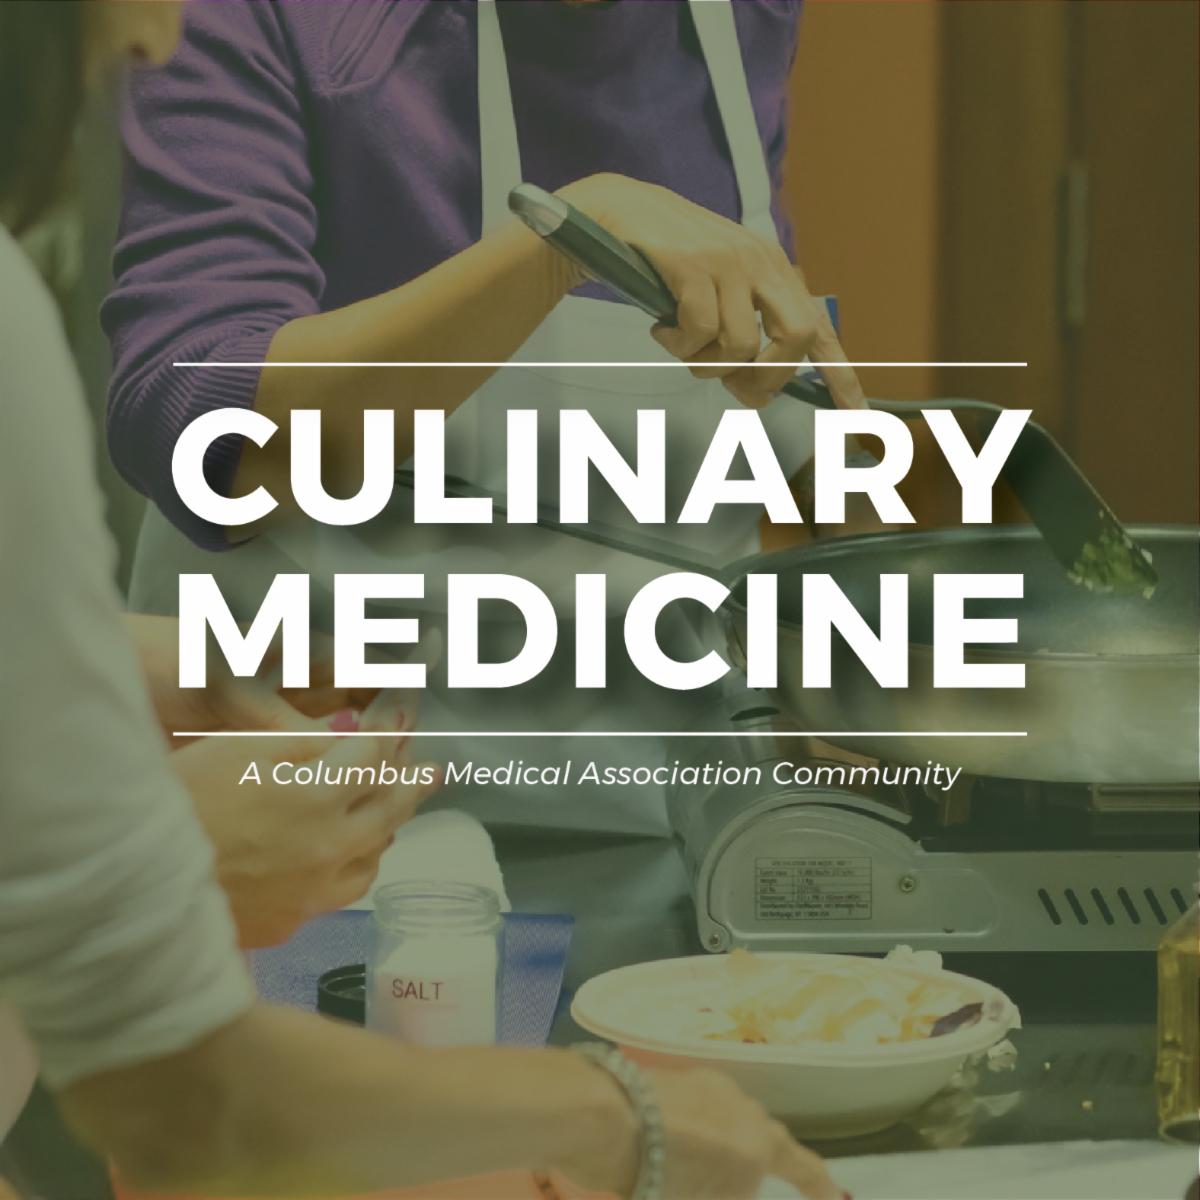 Culinary Medicine Community - 2.png